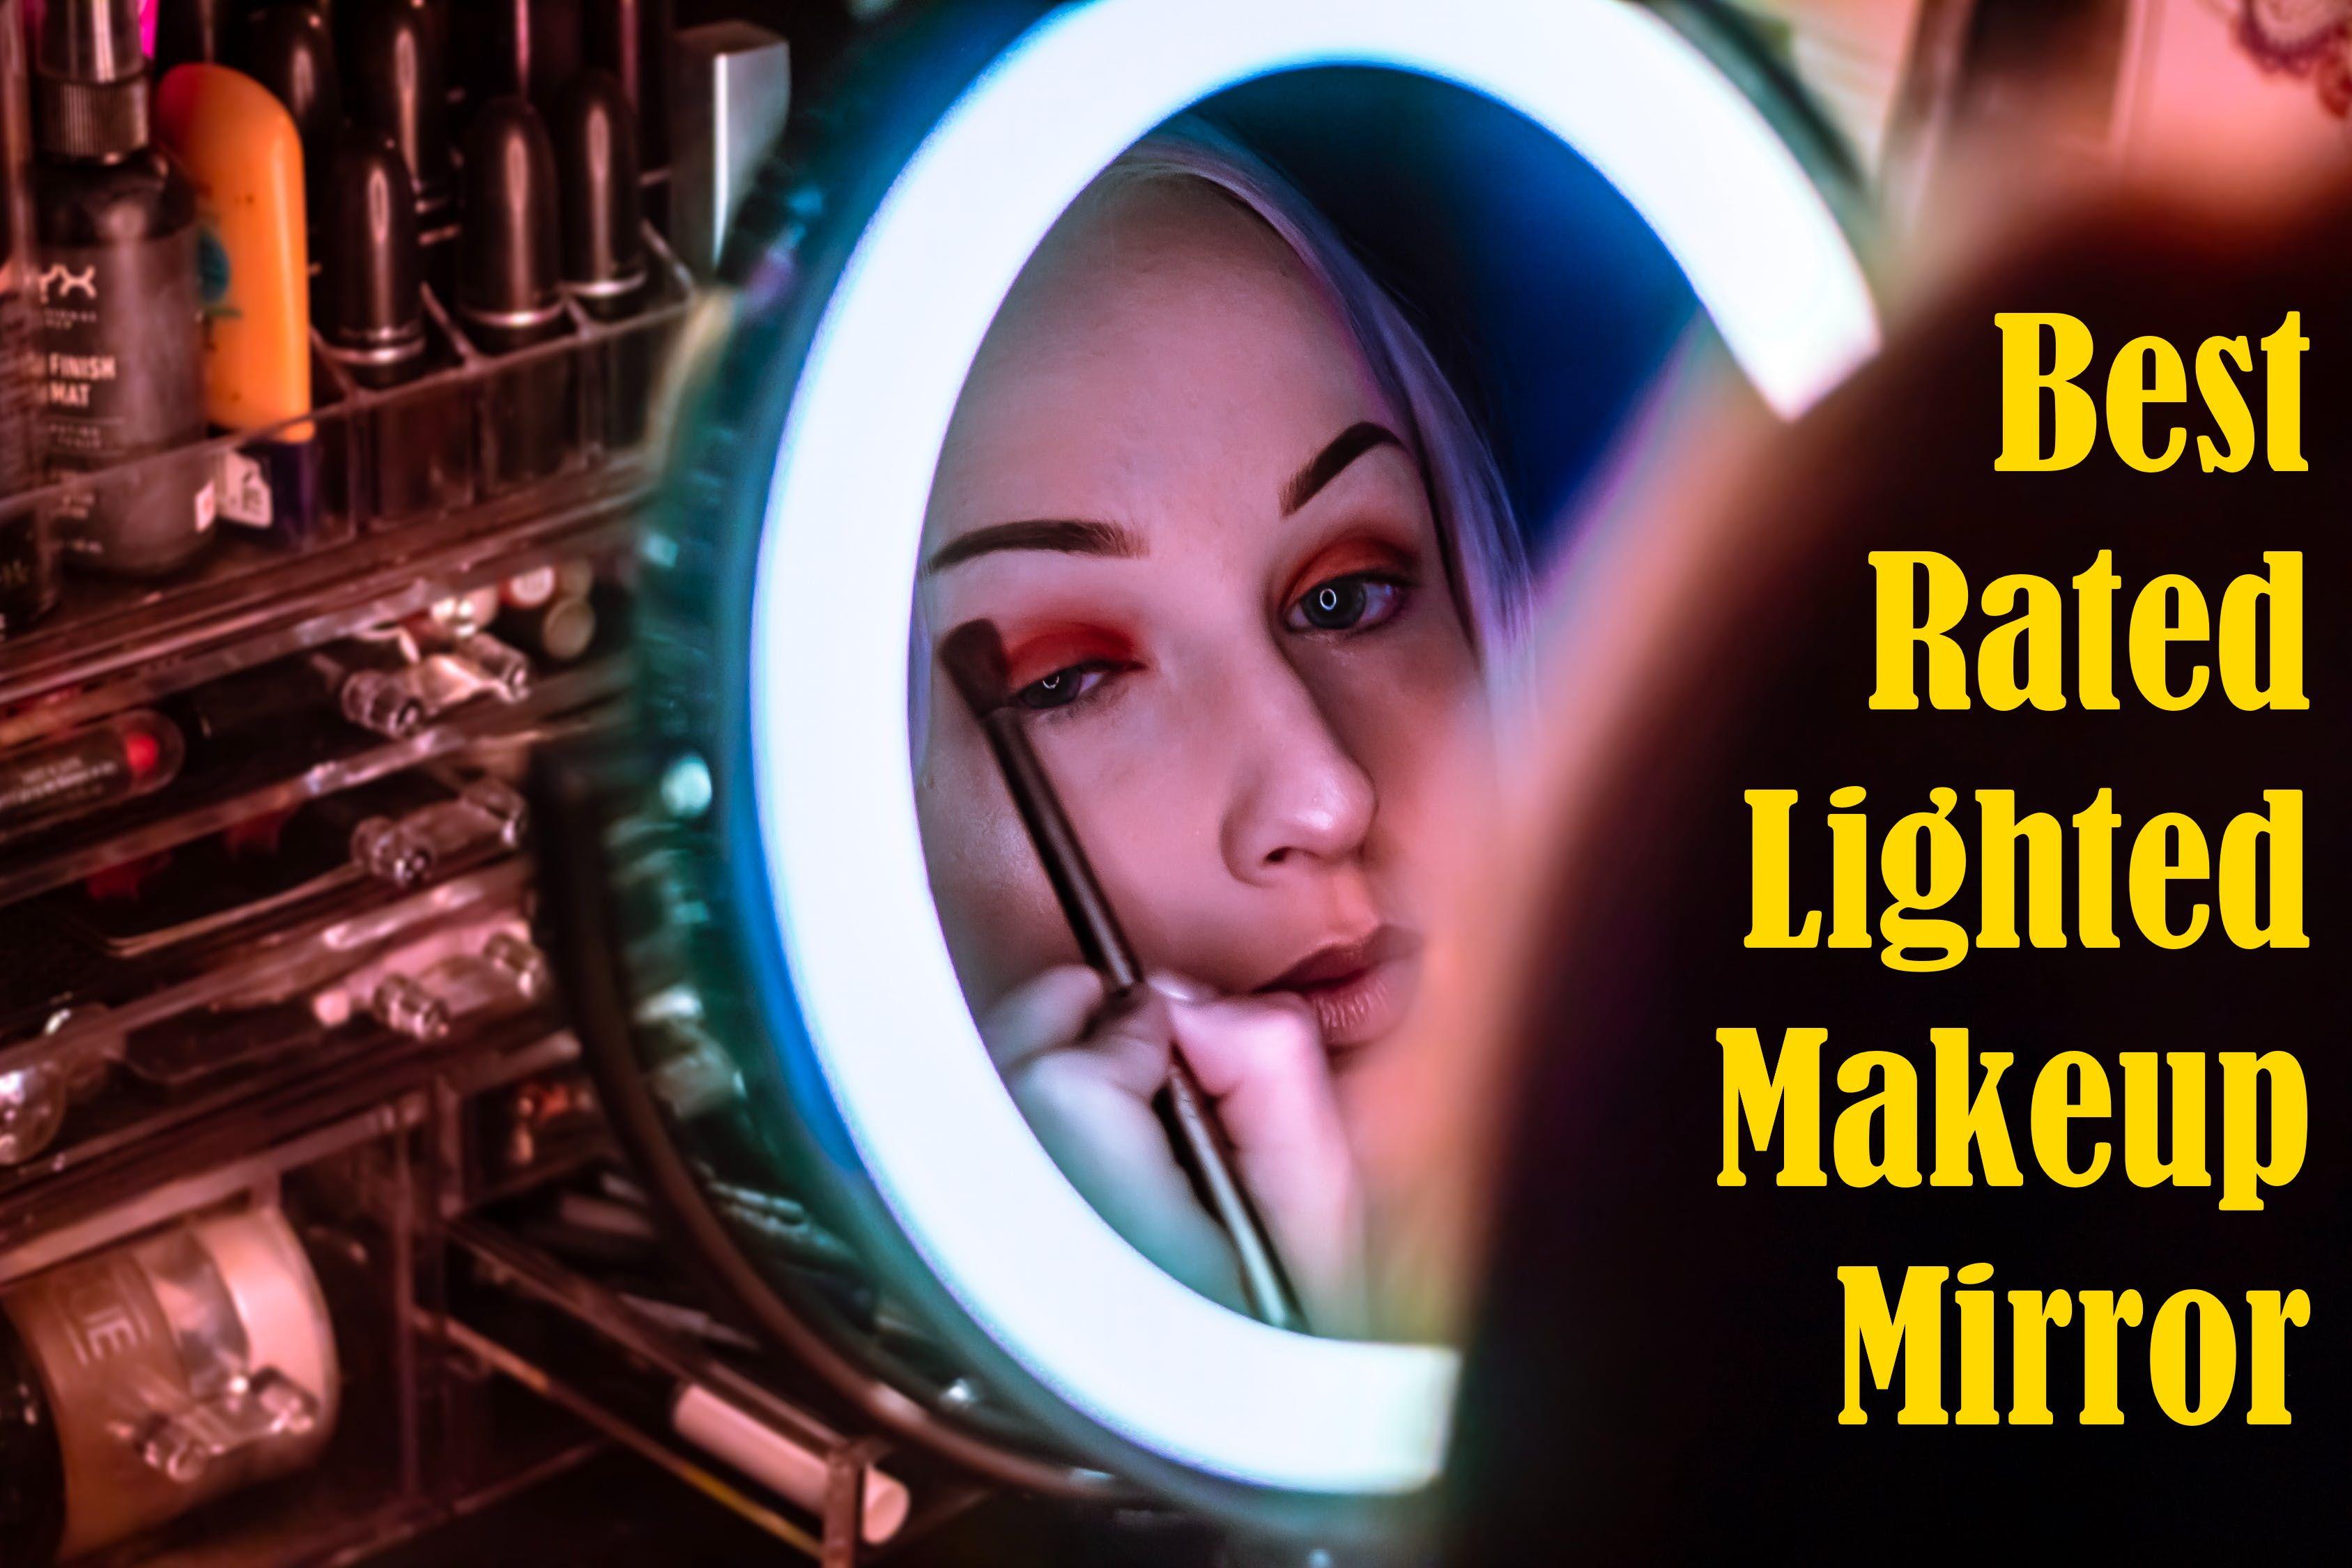 Vanity Magnification Mirror Reviews Magnification mirror